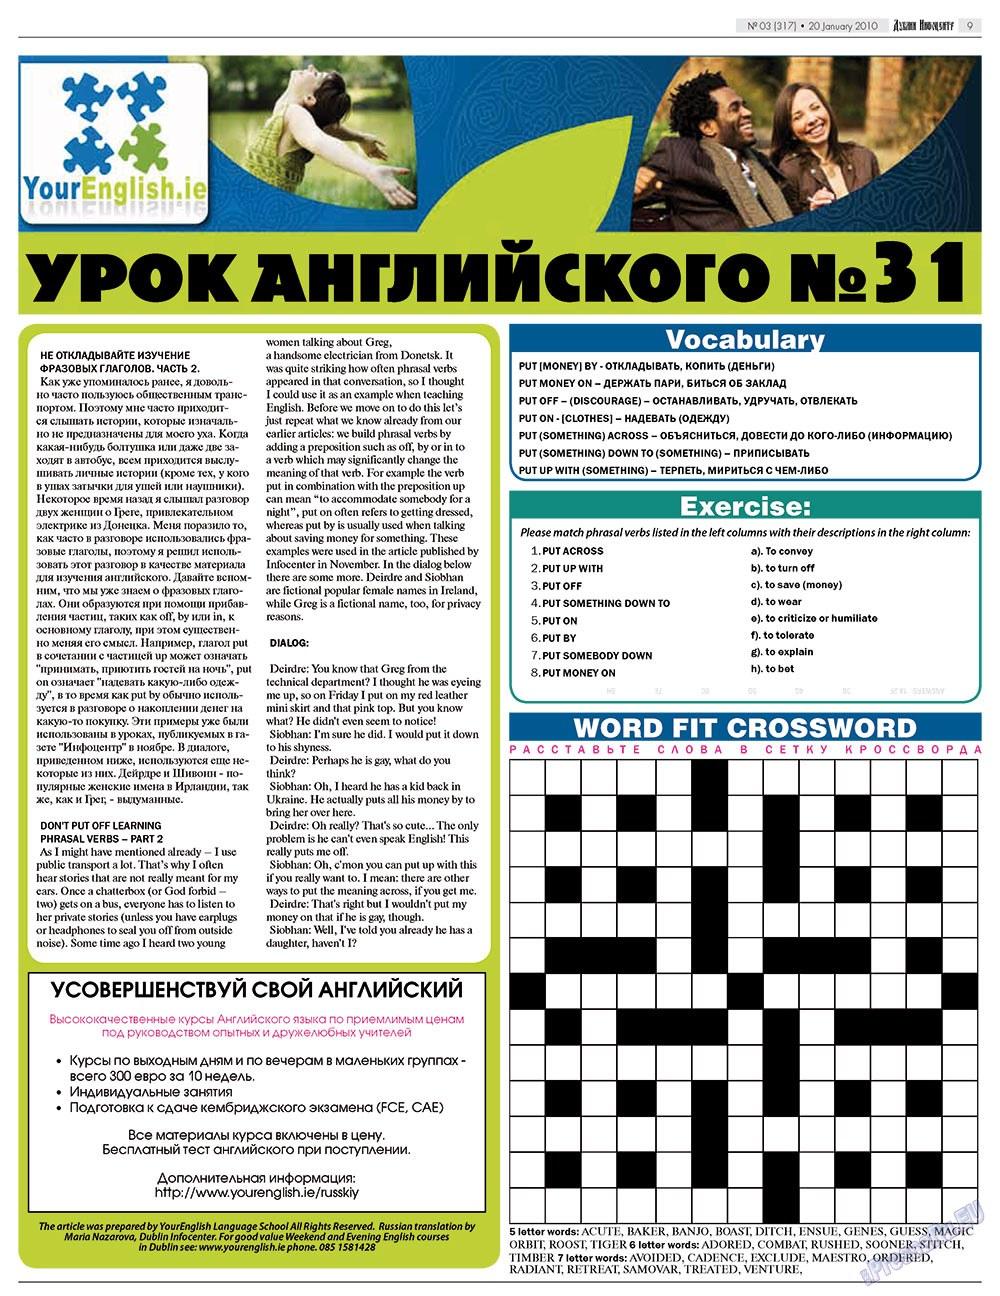 Дублин инфоцентр (газета). 2010 год, номер 3, стр. 9